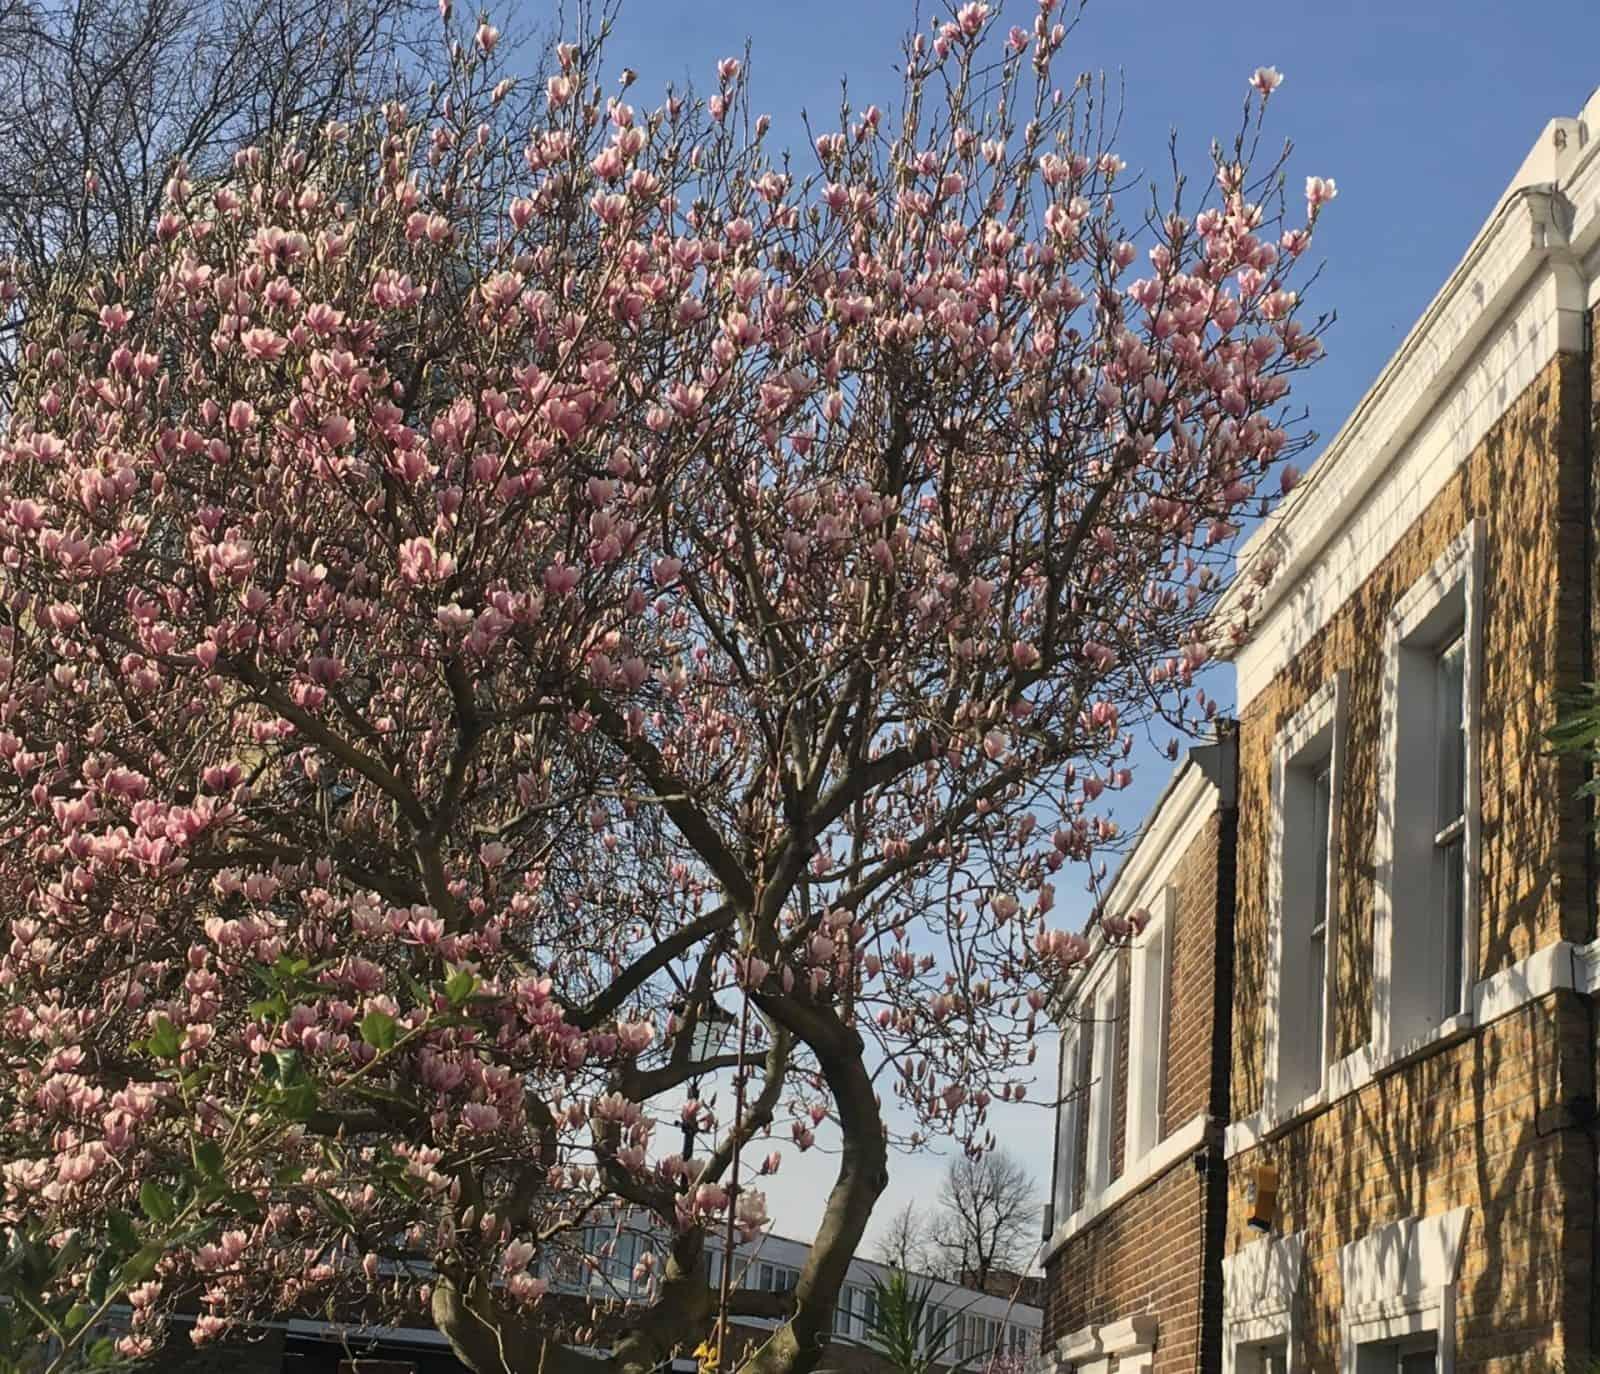 Magnolias blooming - spring in London